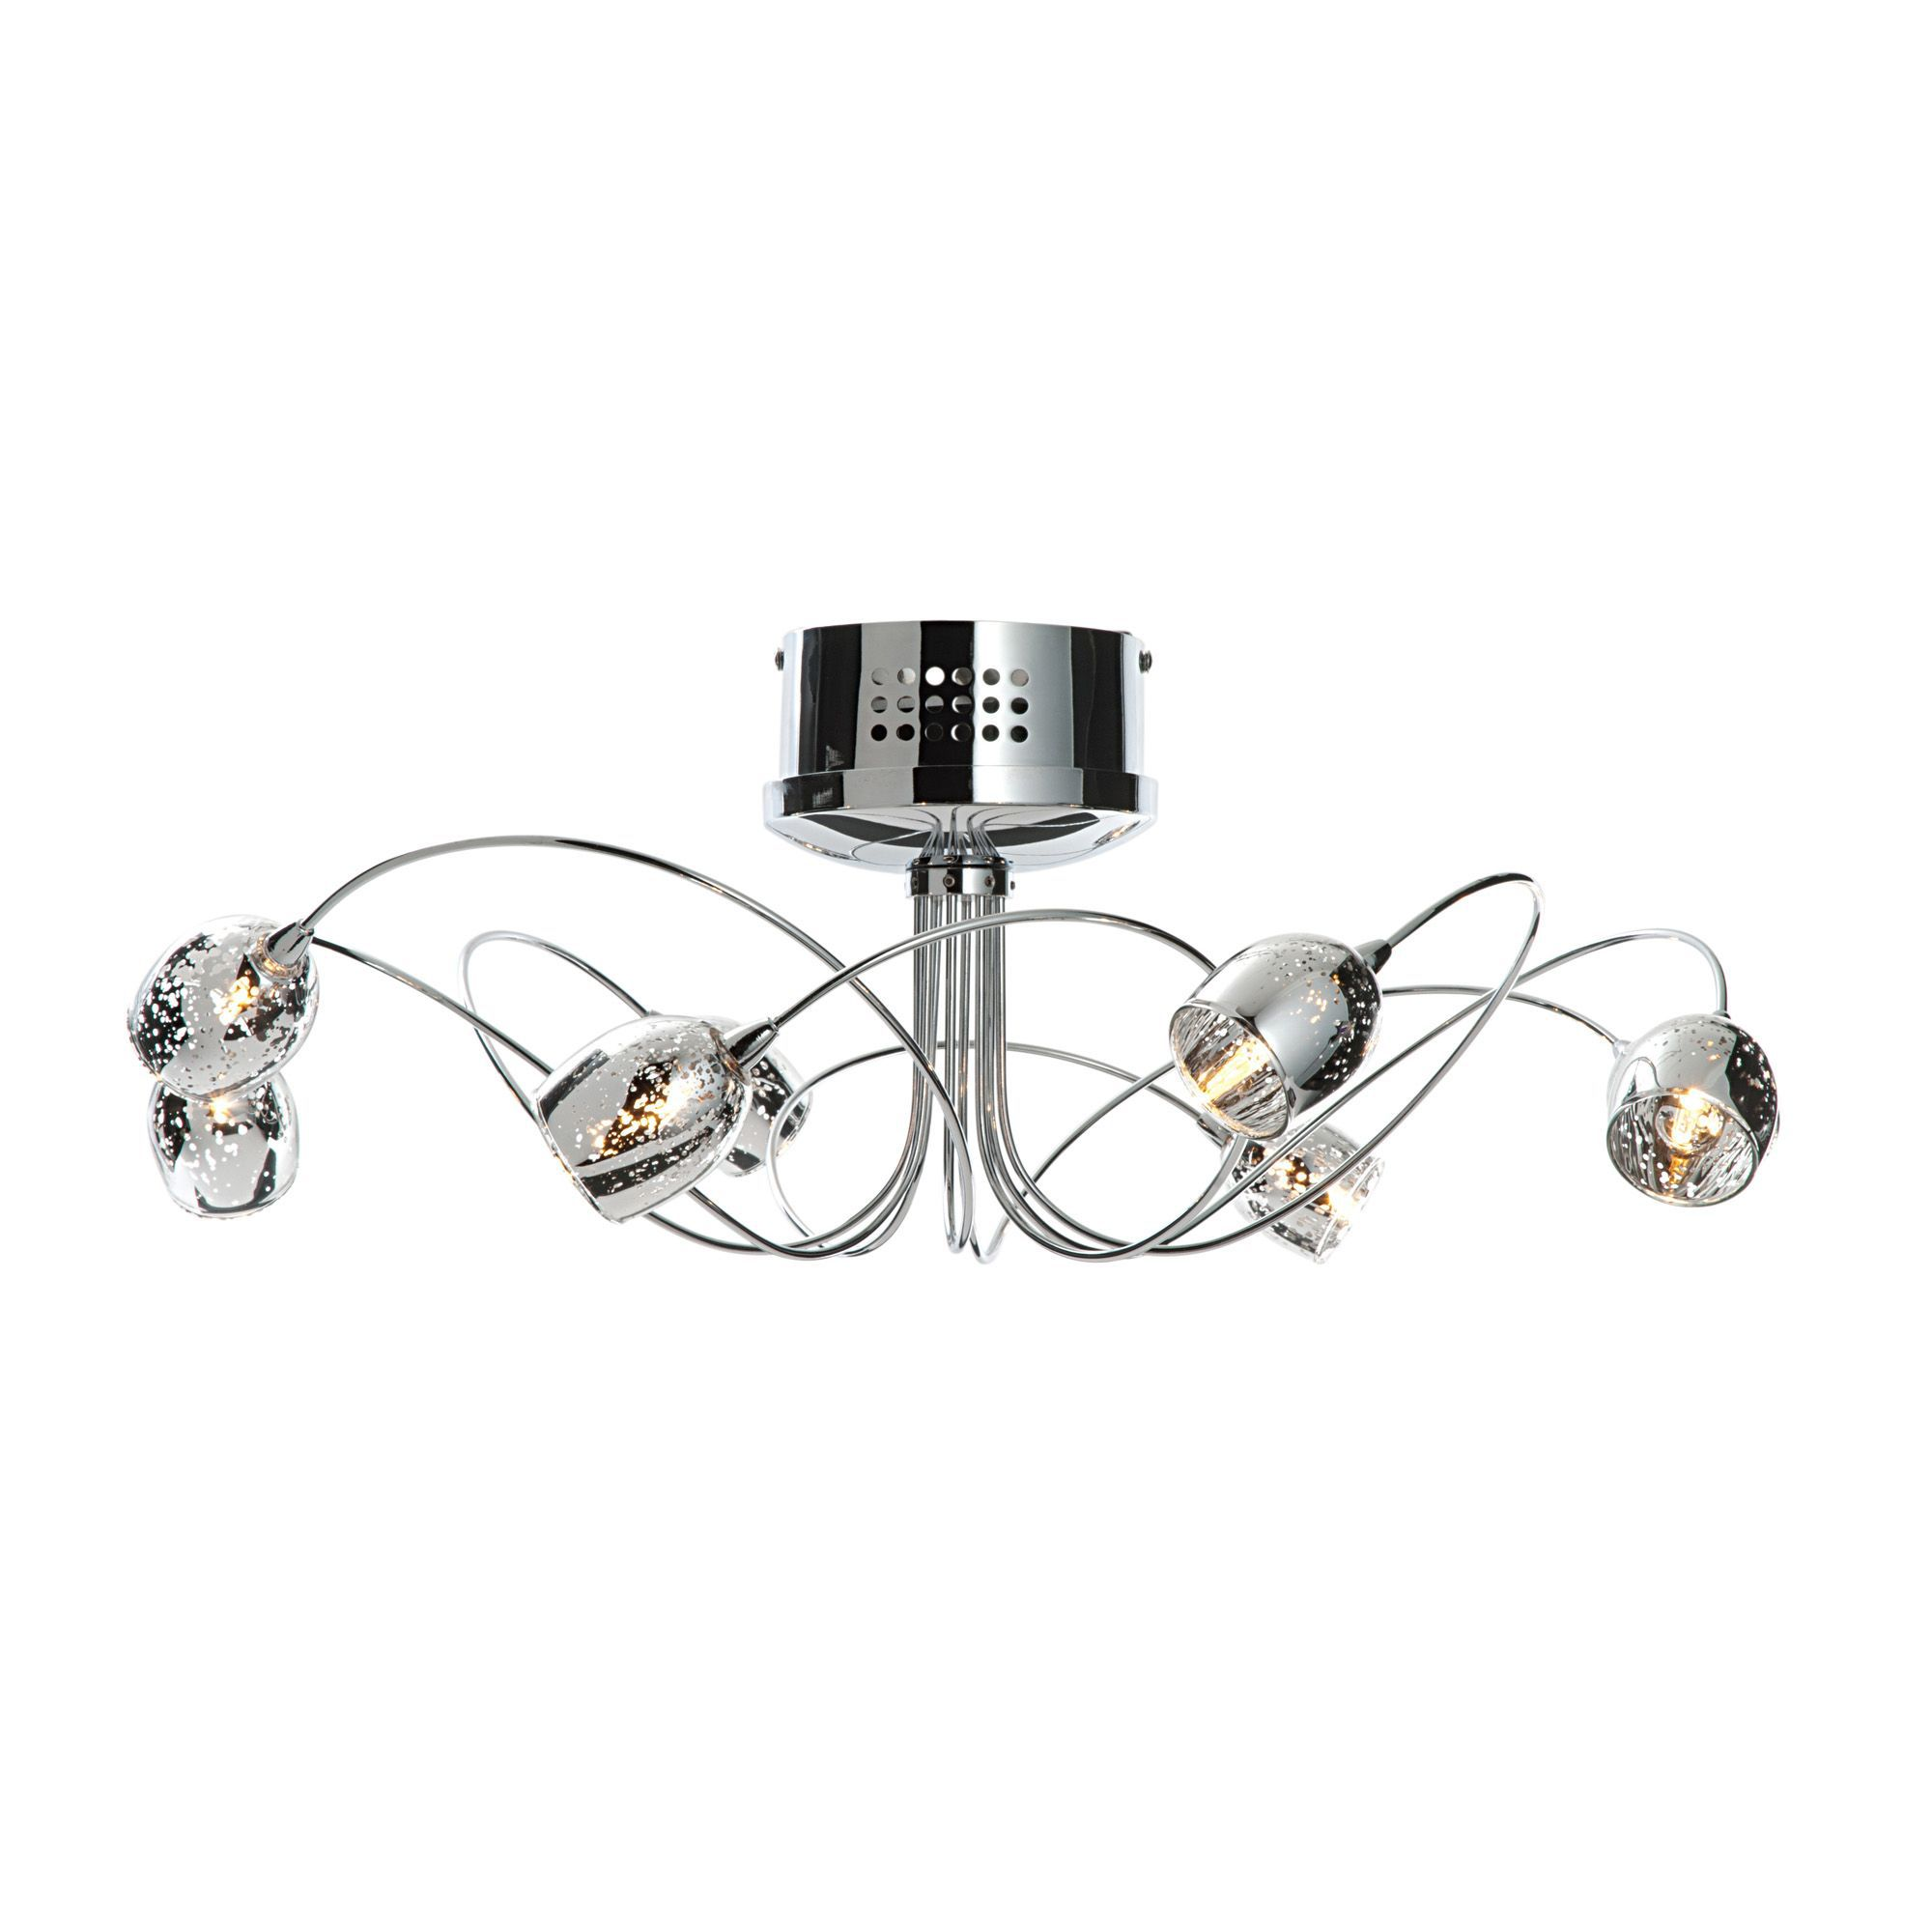 Aero Chrome Effect 8 Lamp Semi Flush Ceiling Light